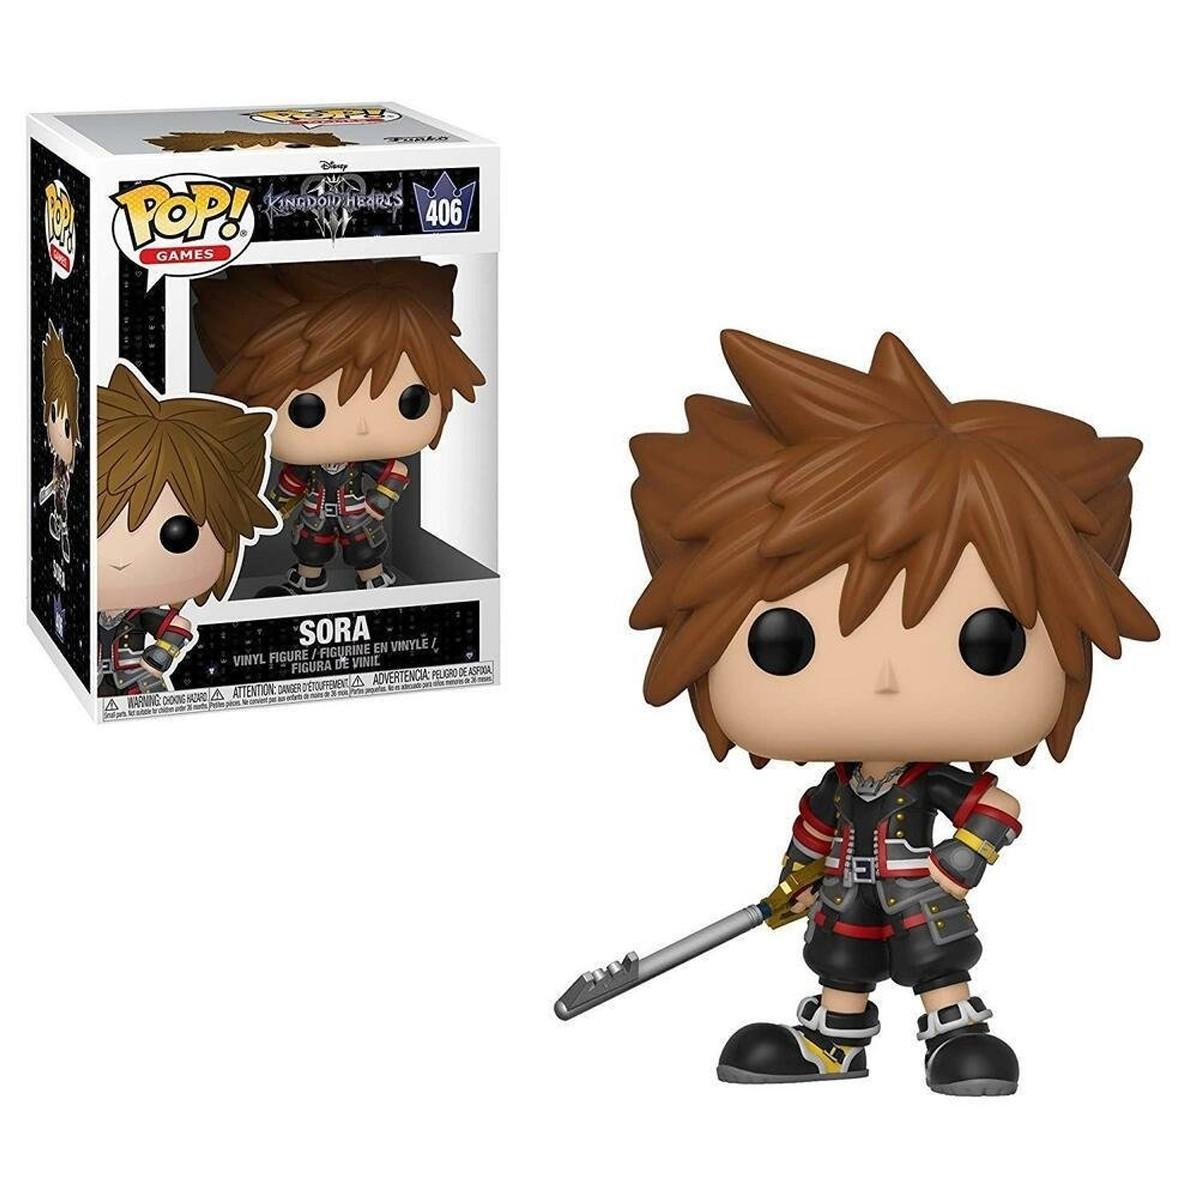 Sora #406 - Kingdom Hearts - Funko Pop! Games